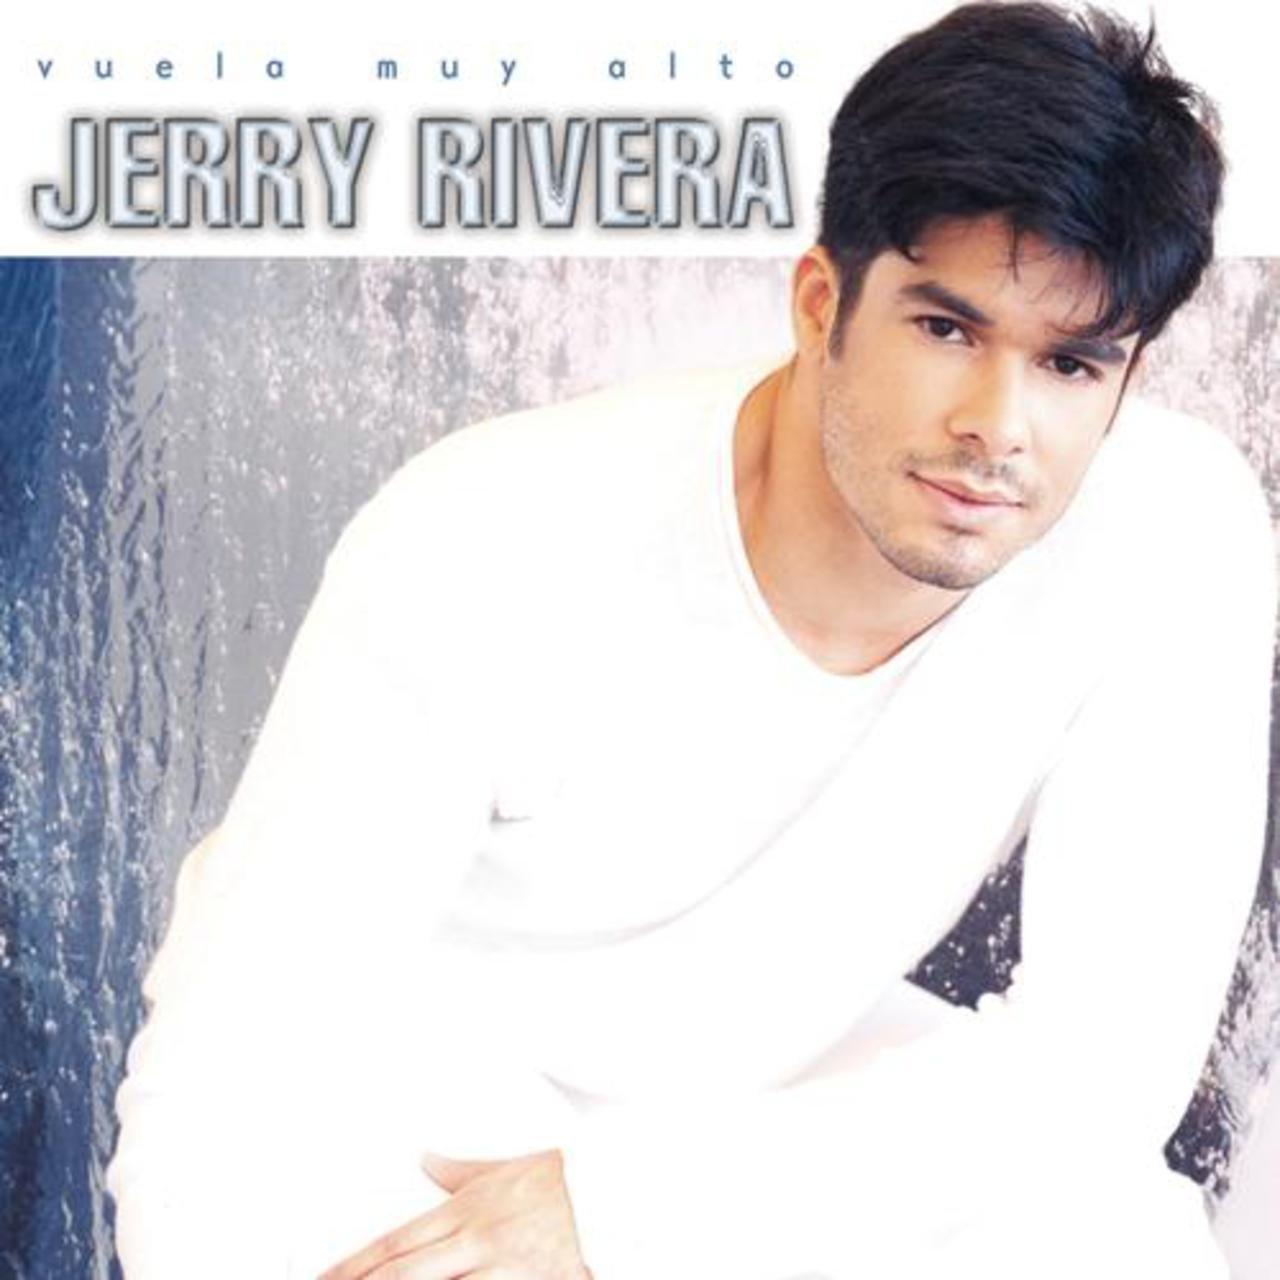 Torrent Jerry Rivera Exitos